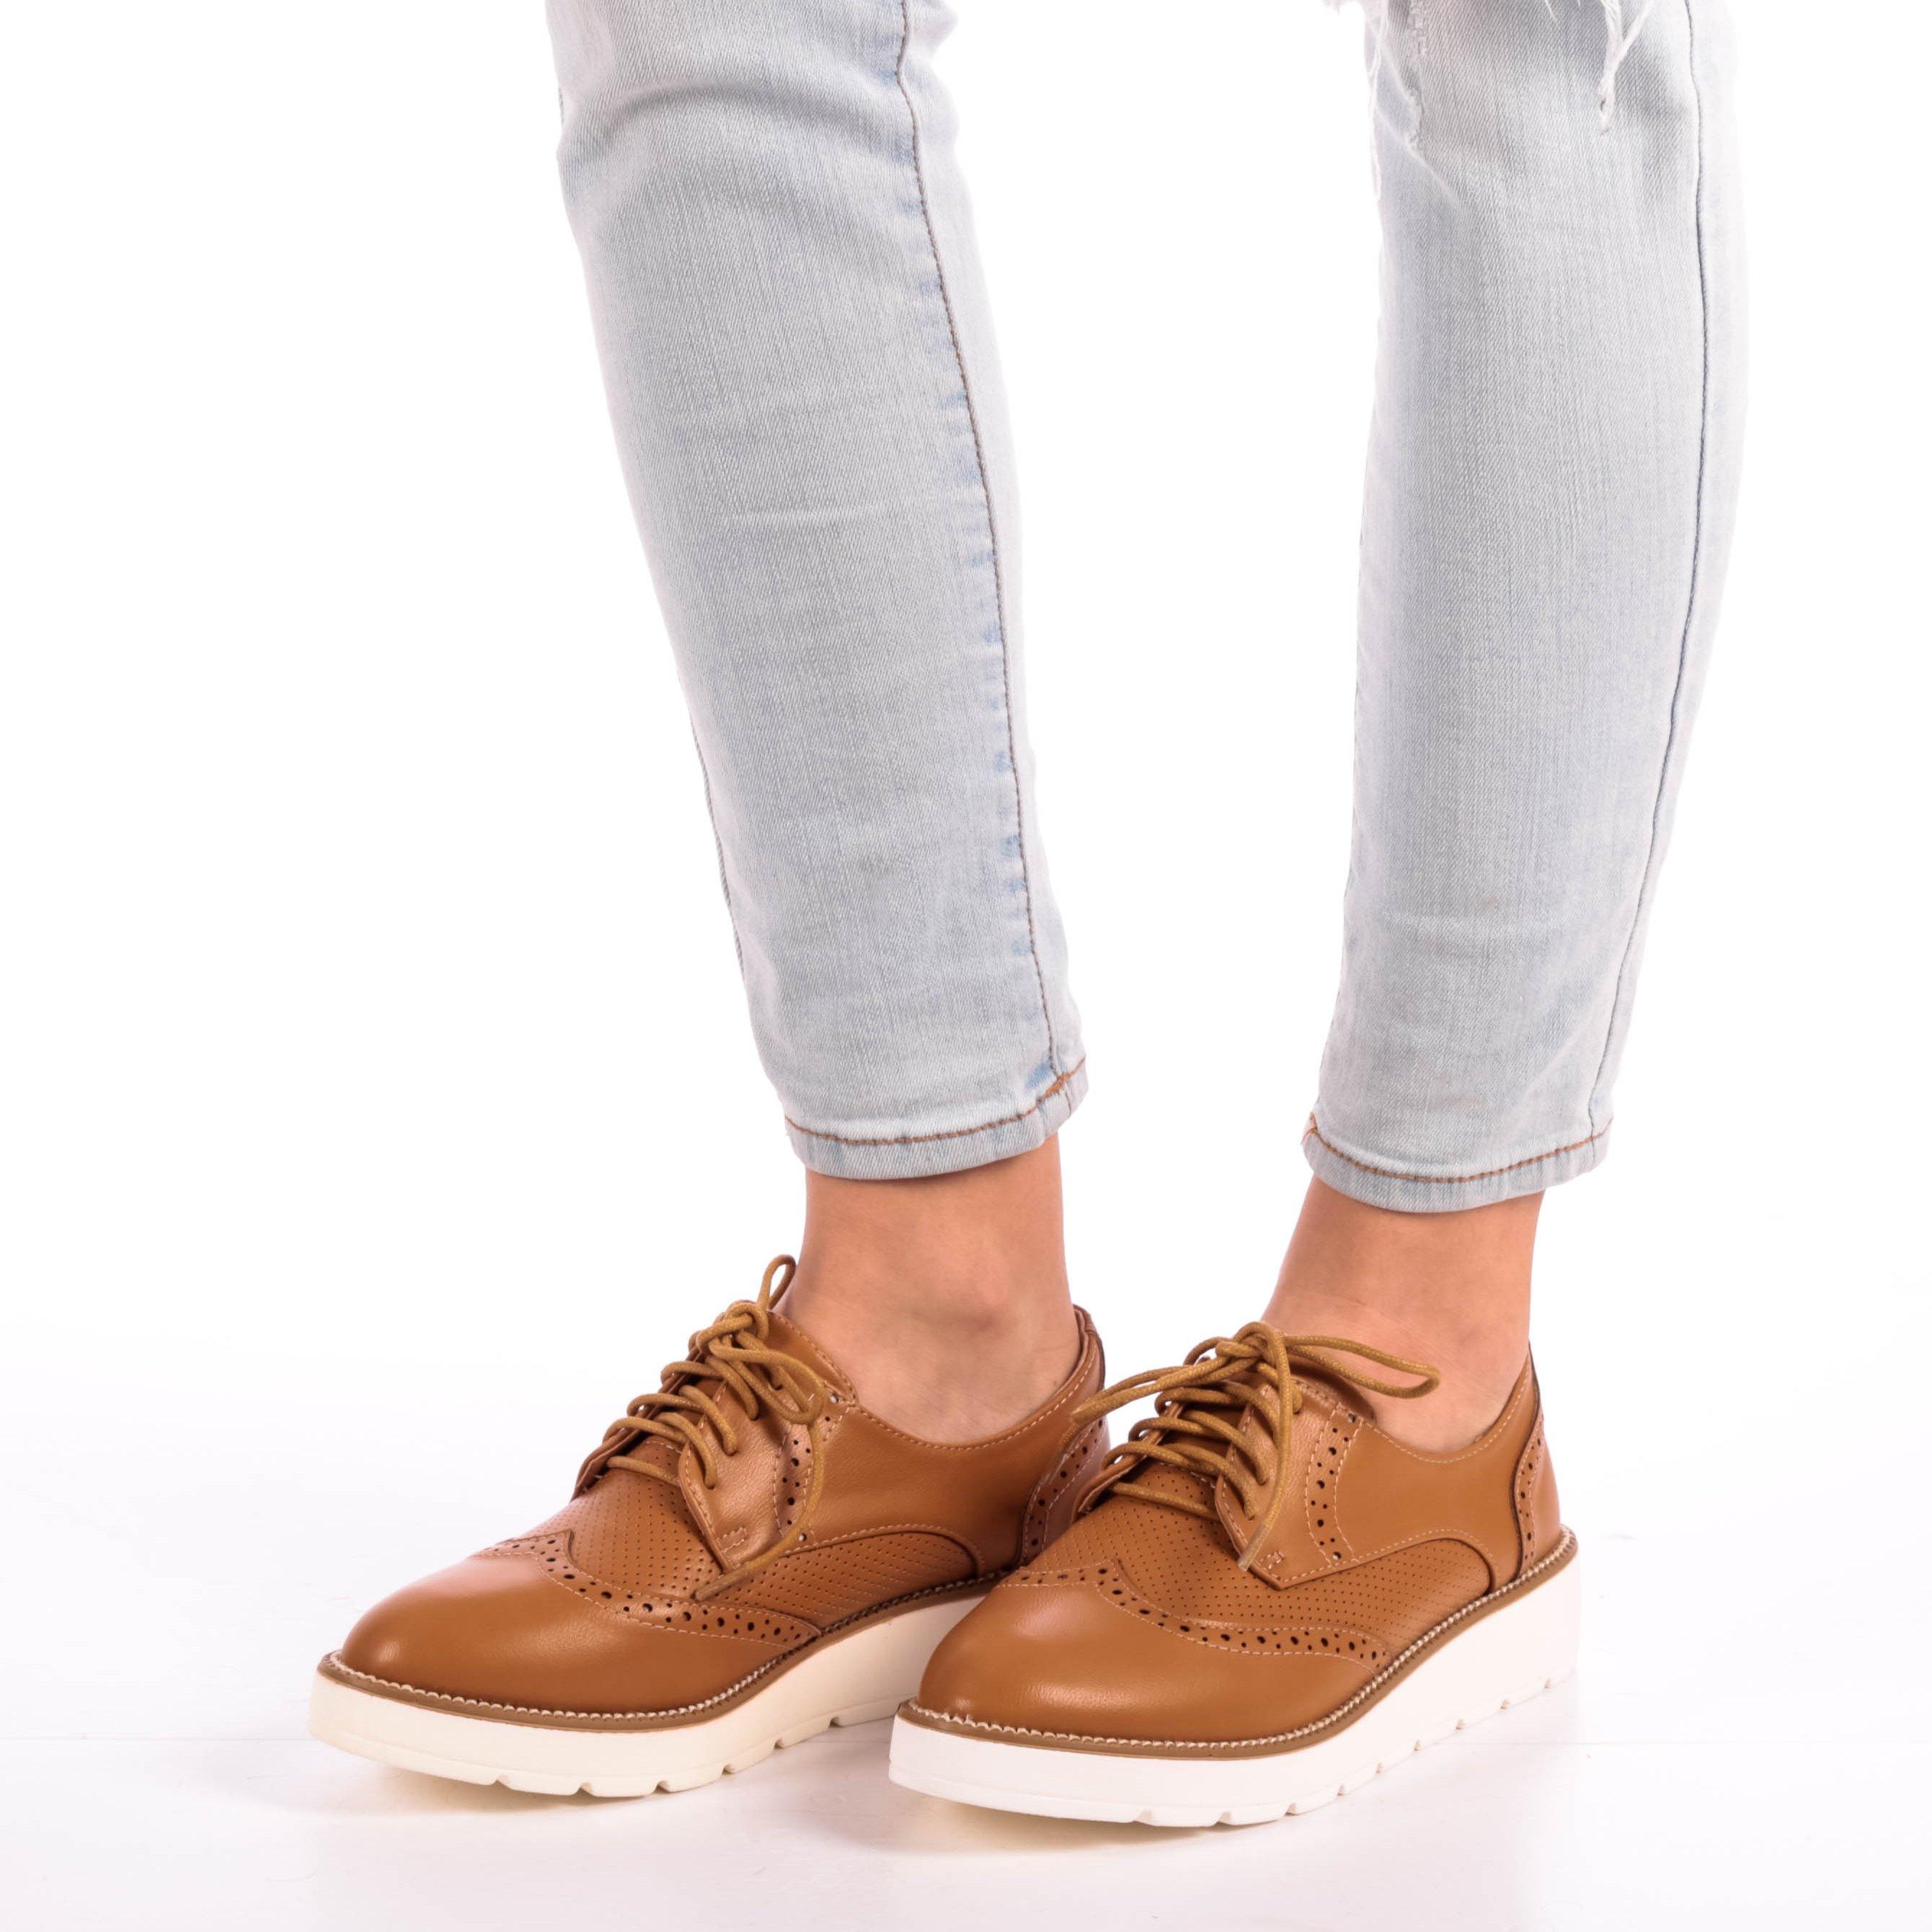 Pantofi dama Alyce camel